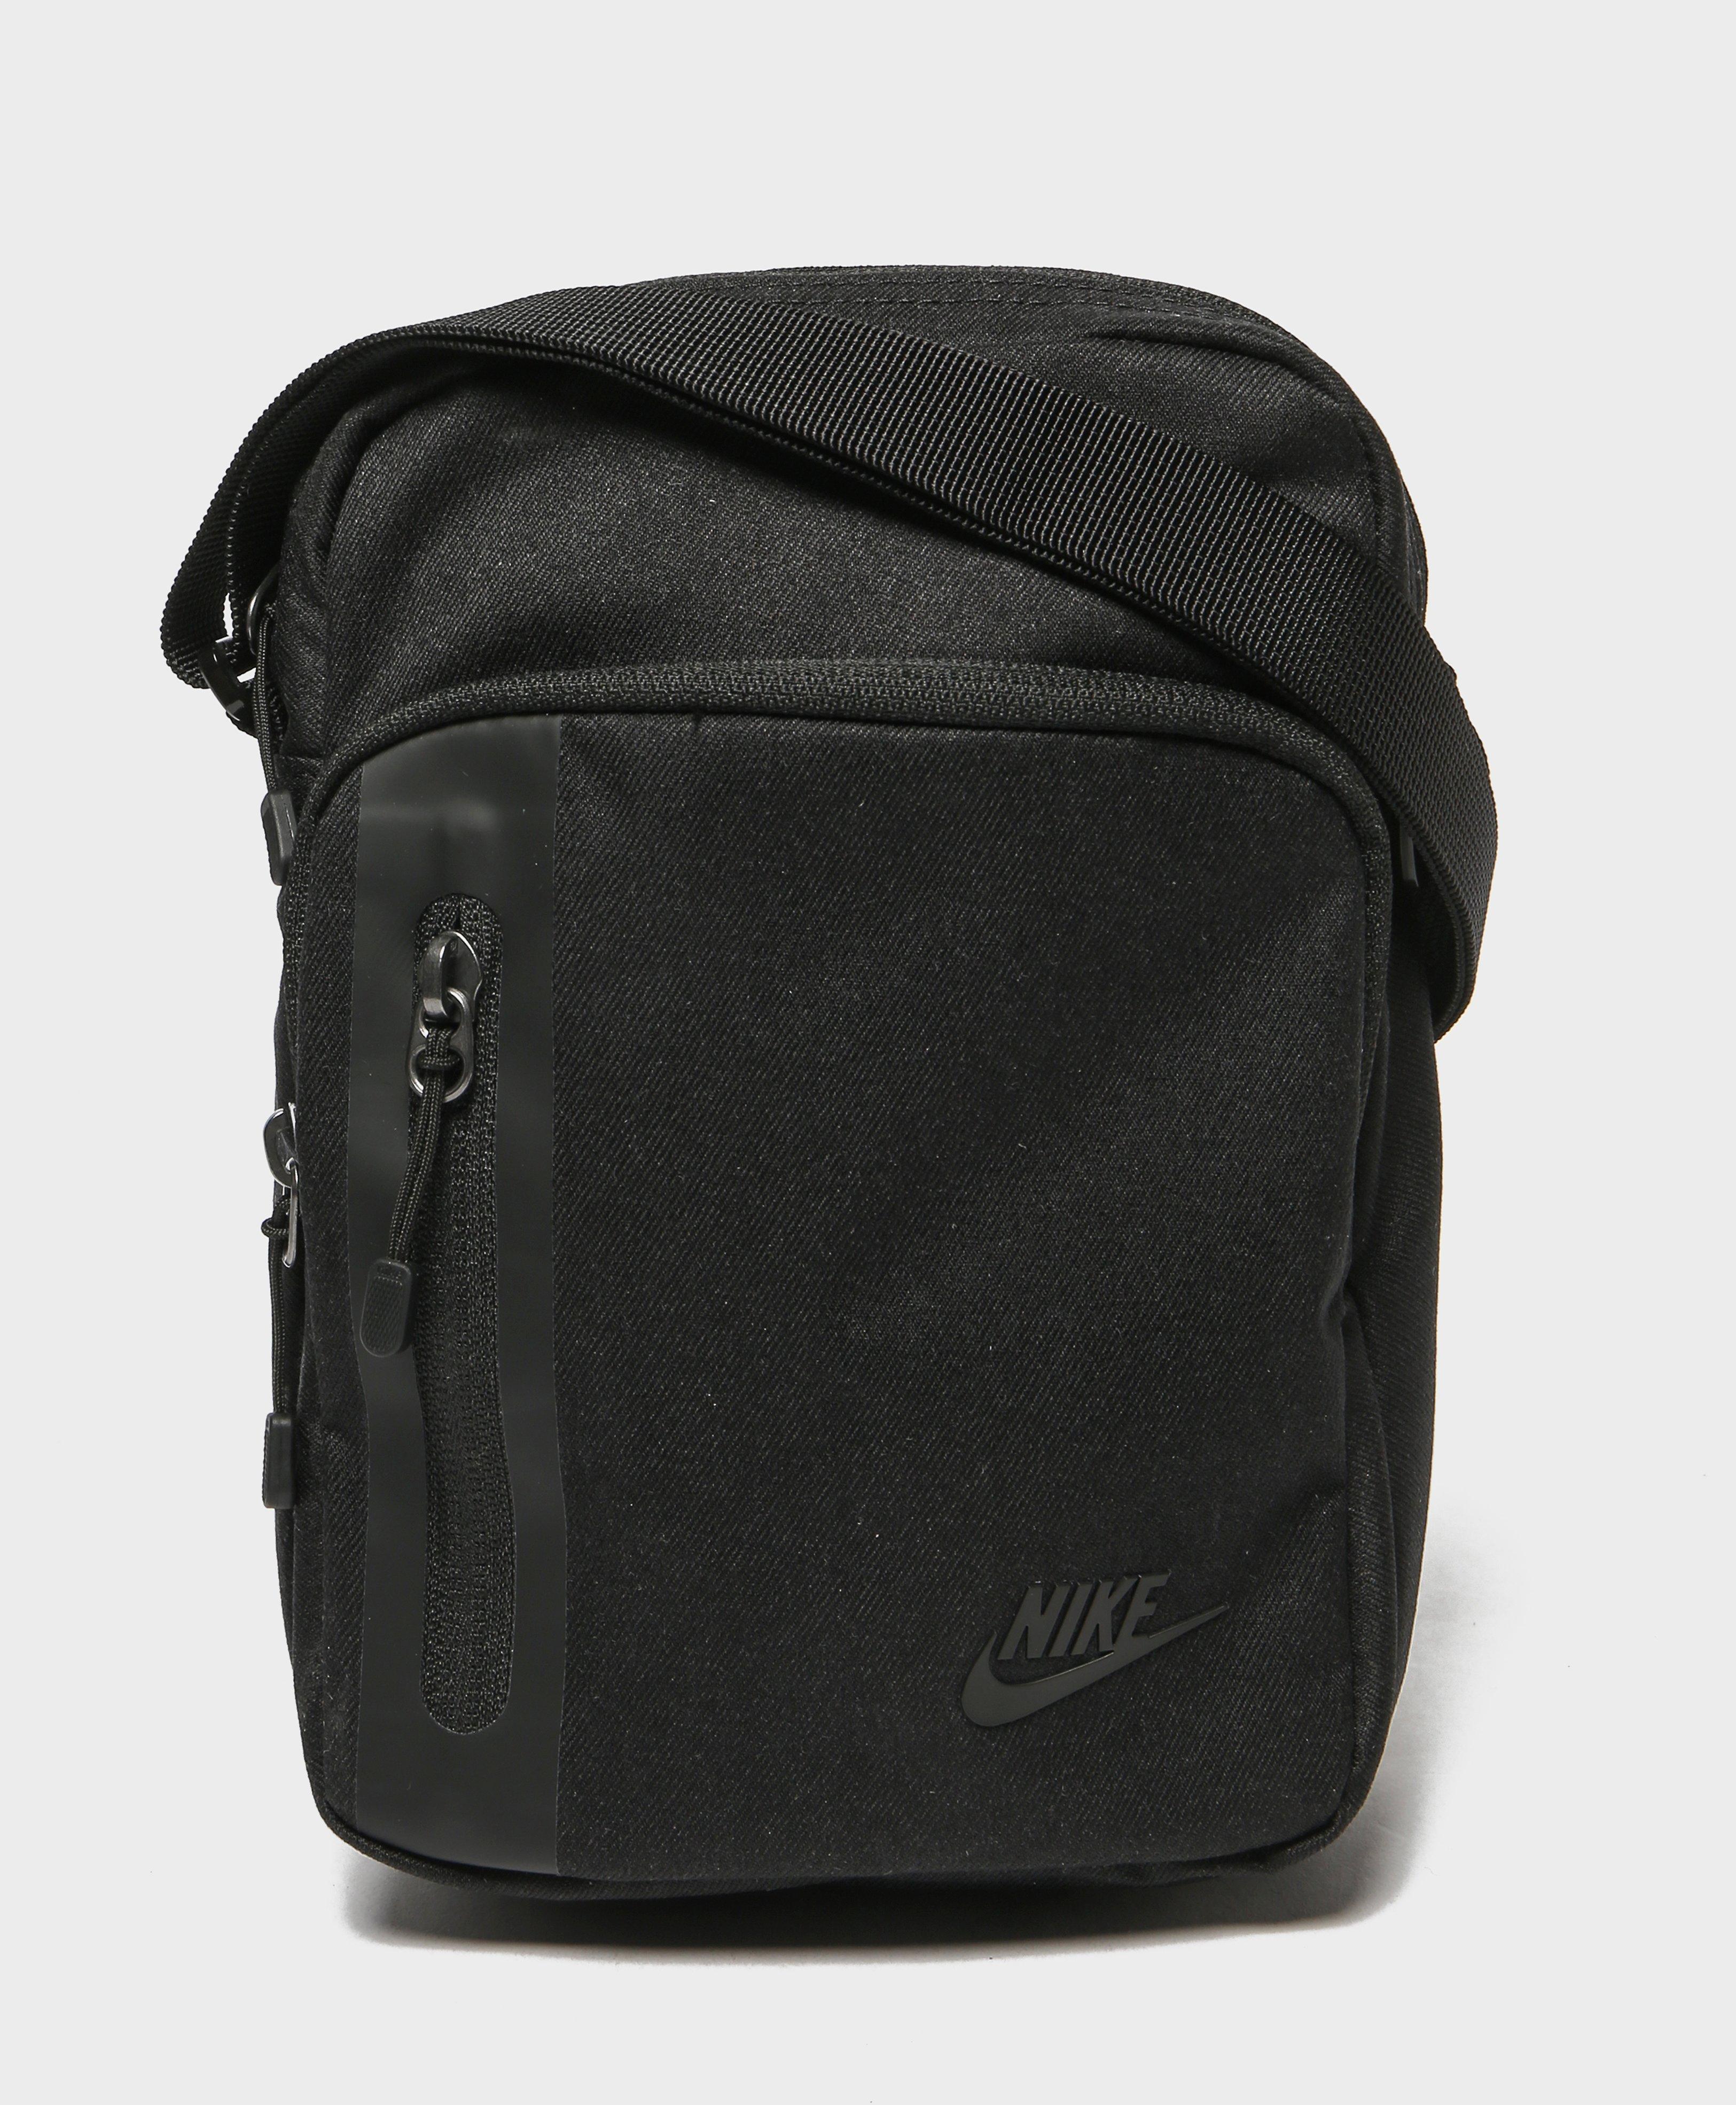 Nike Core Small Crossbody Bag in Black for Men - Lyst 93a5b5aaa74ba